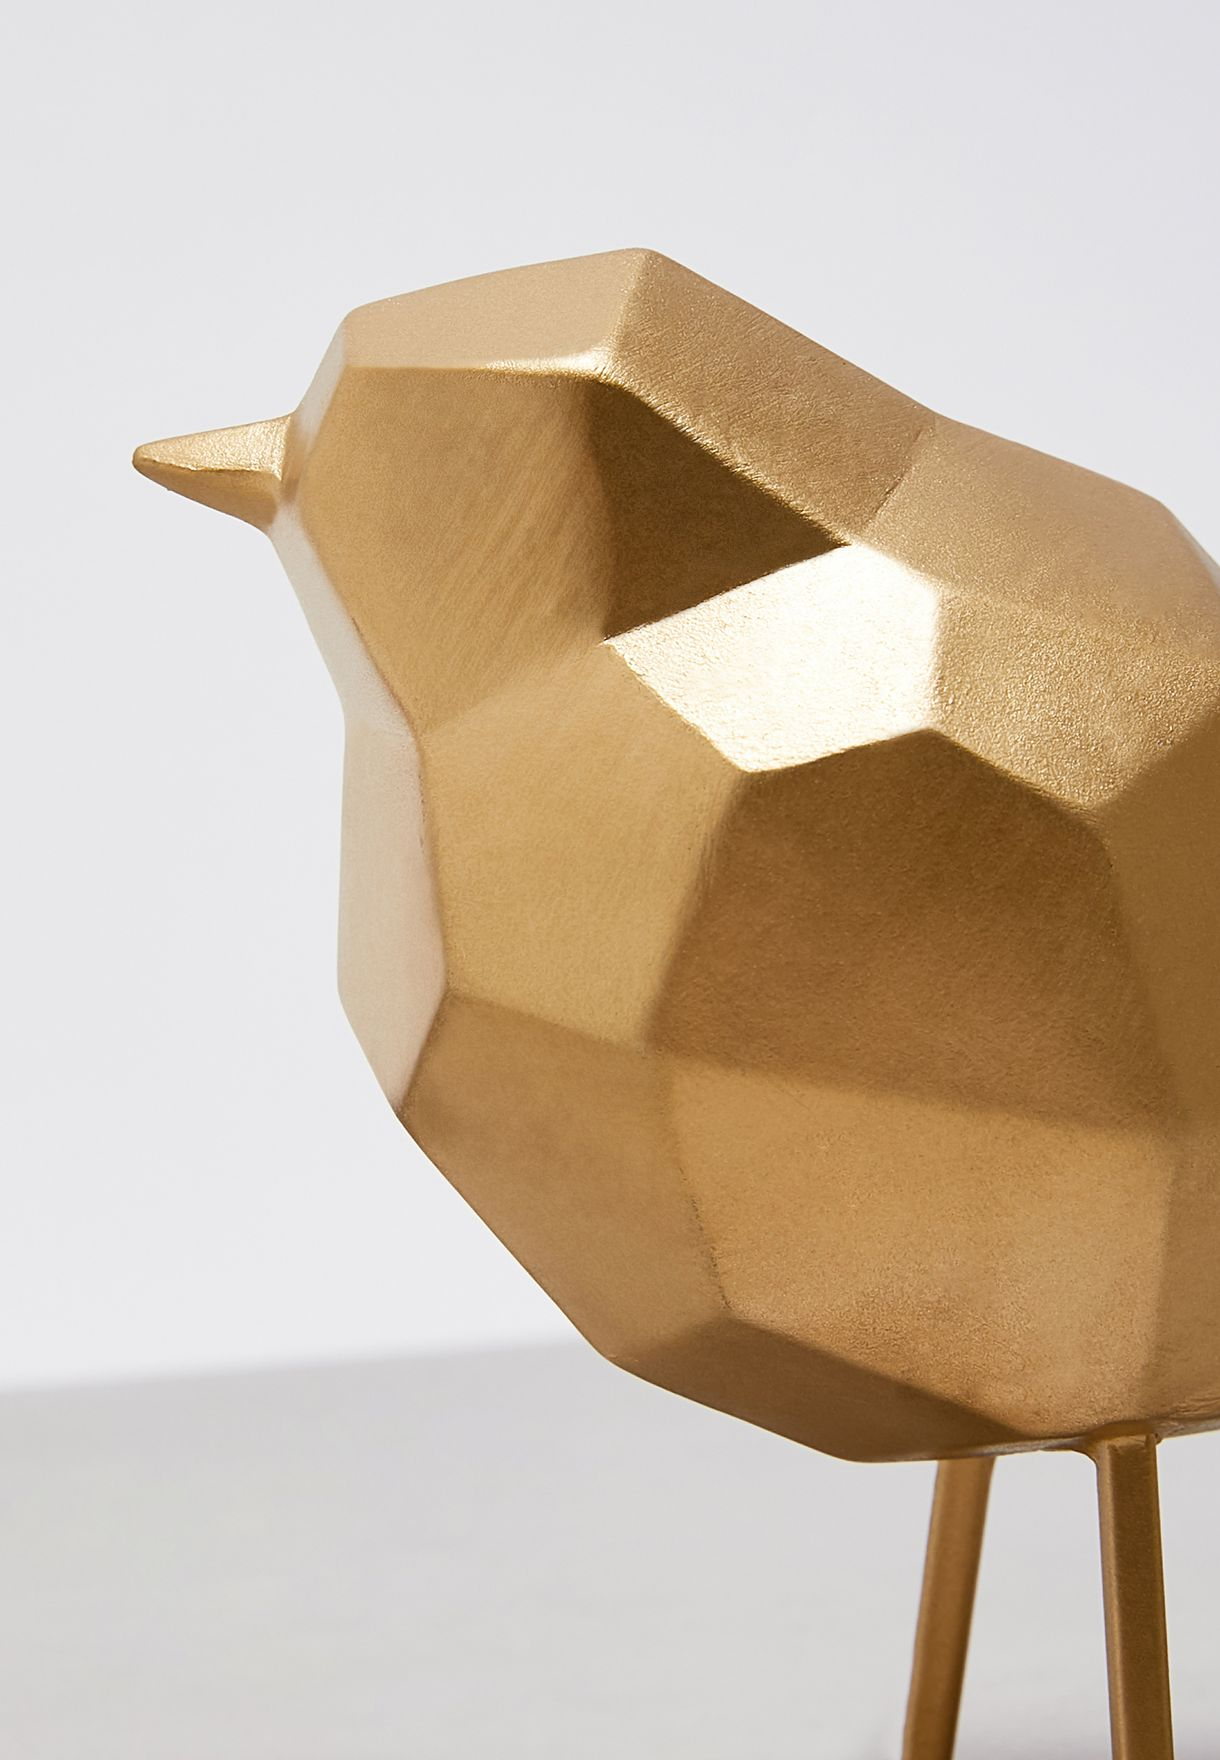 Small Bird Statue